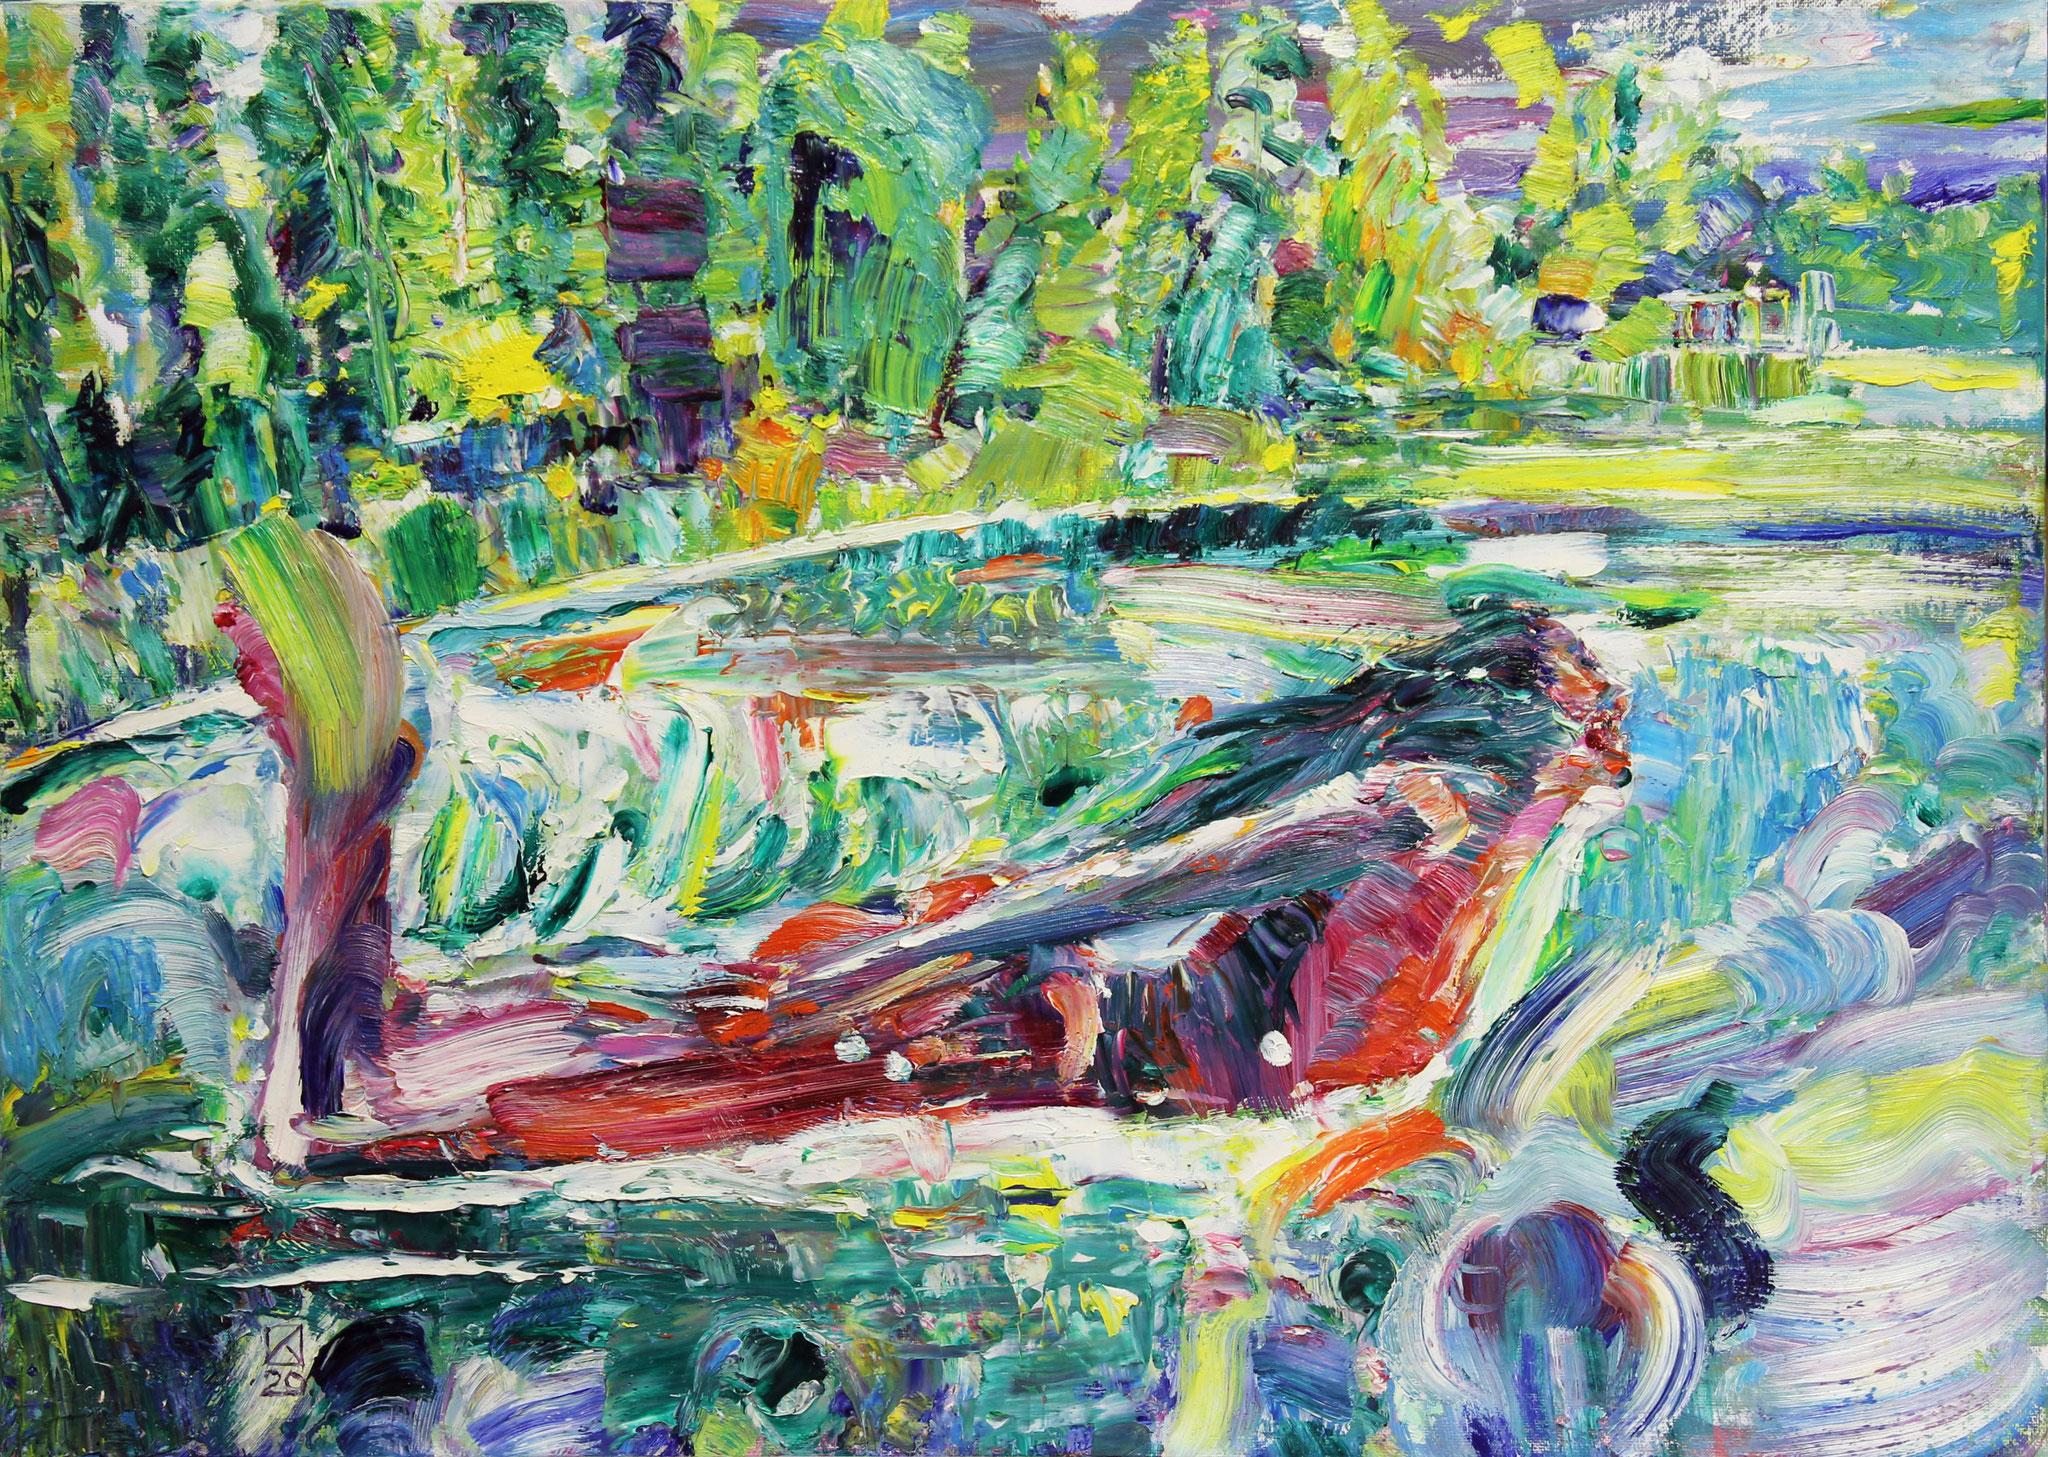 The mermaid in the neskuchny garden. 2020. Oil on cardboard. 50 x 70